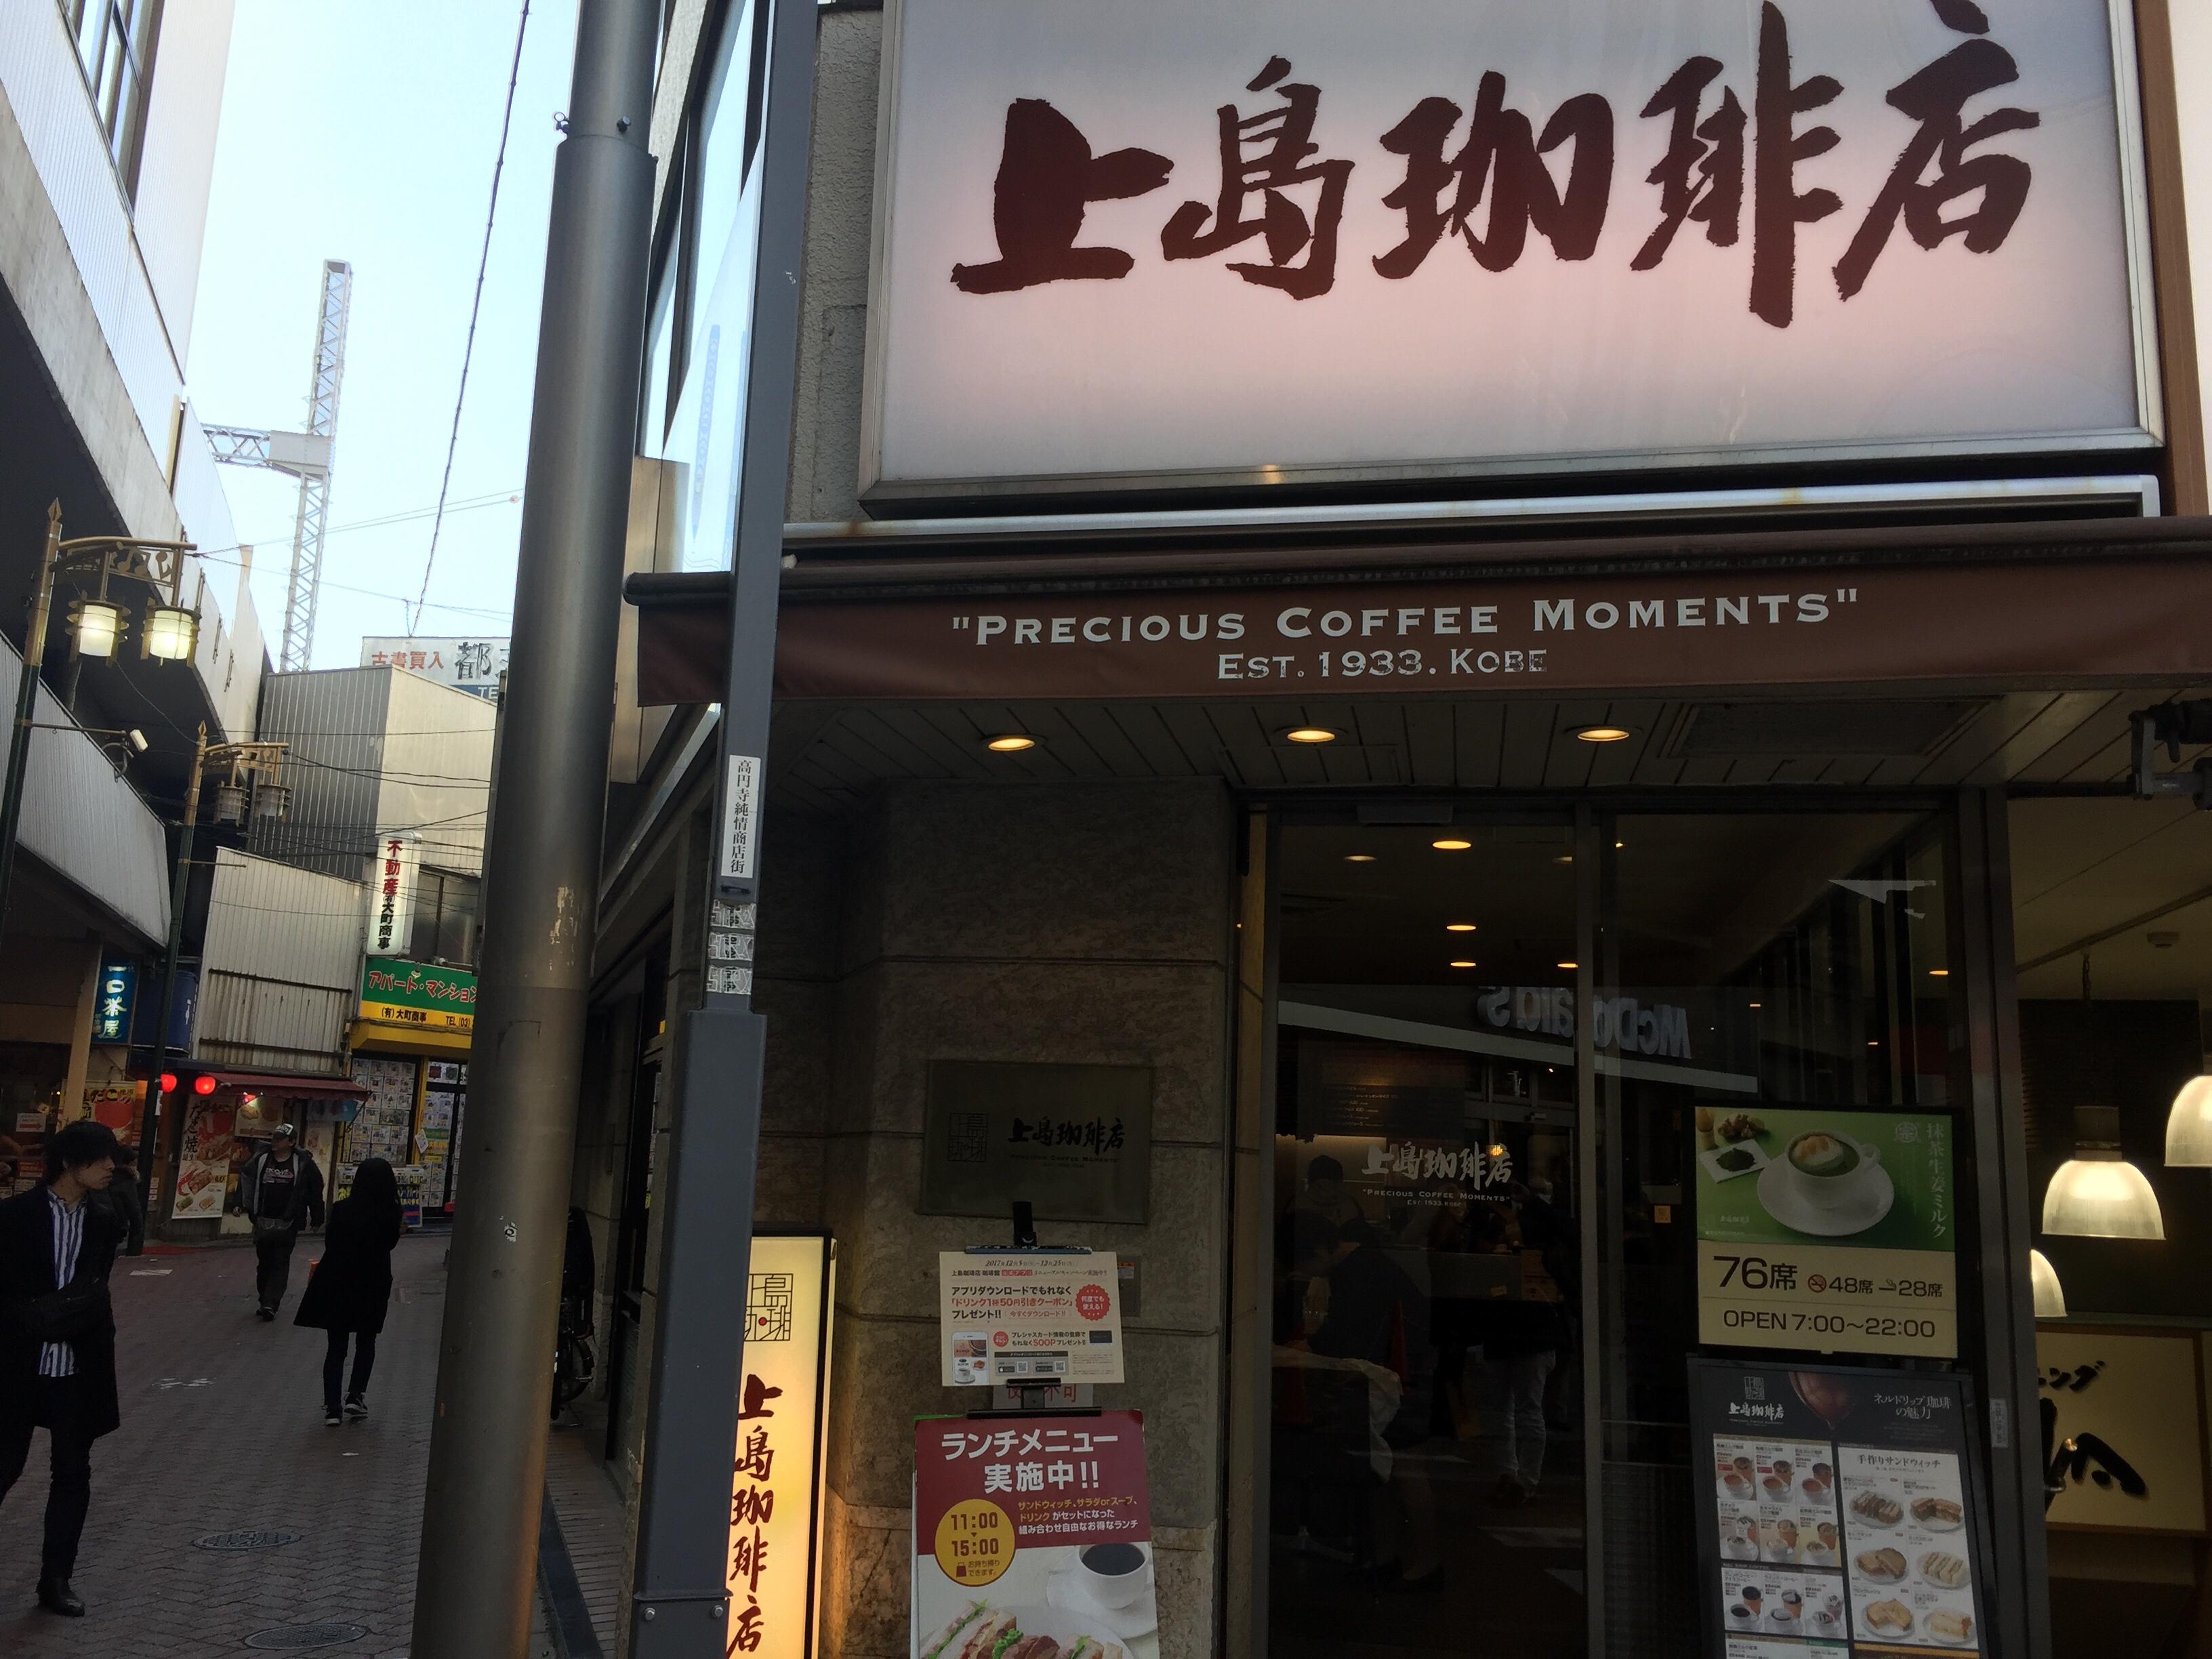 高円寺駅 電源カフェ 上島珈琲店 高円寺北口店